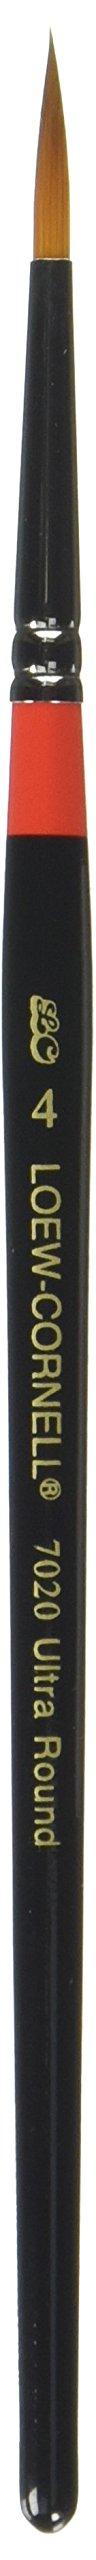 Loew-Cornell Golden Taklon Ultra Round Brush-Size 4 (7020-4) by Loew-Cornell